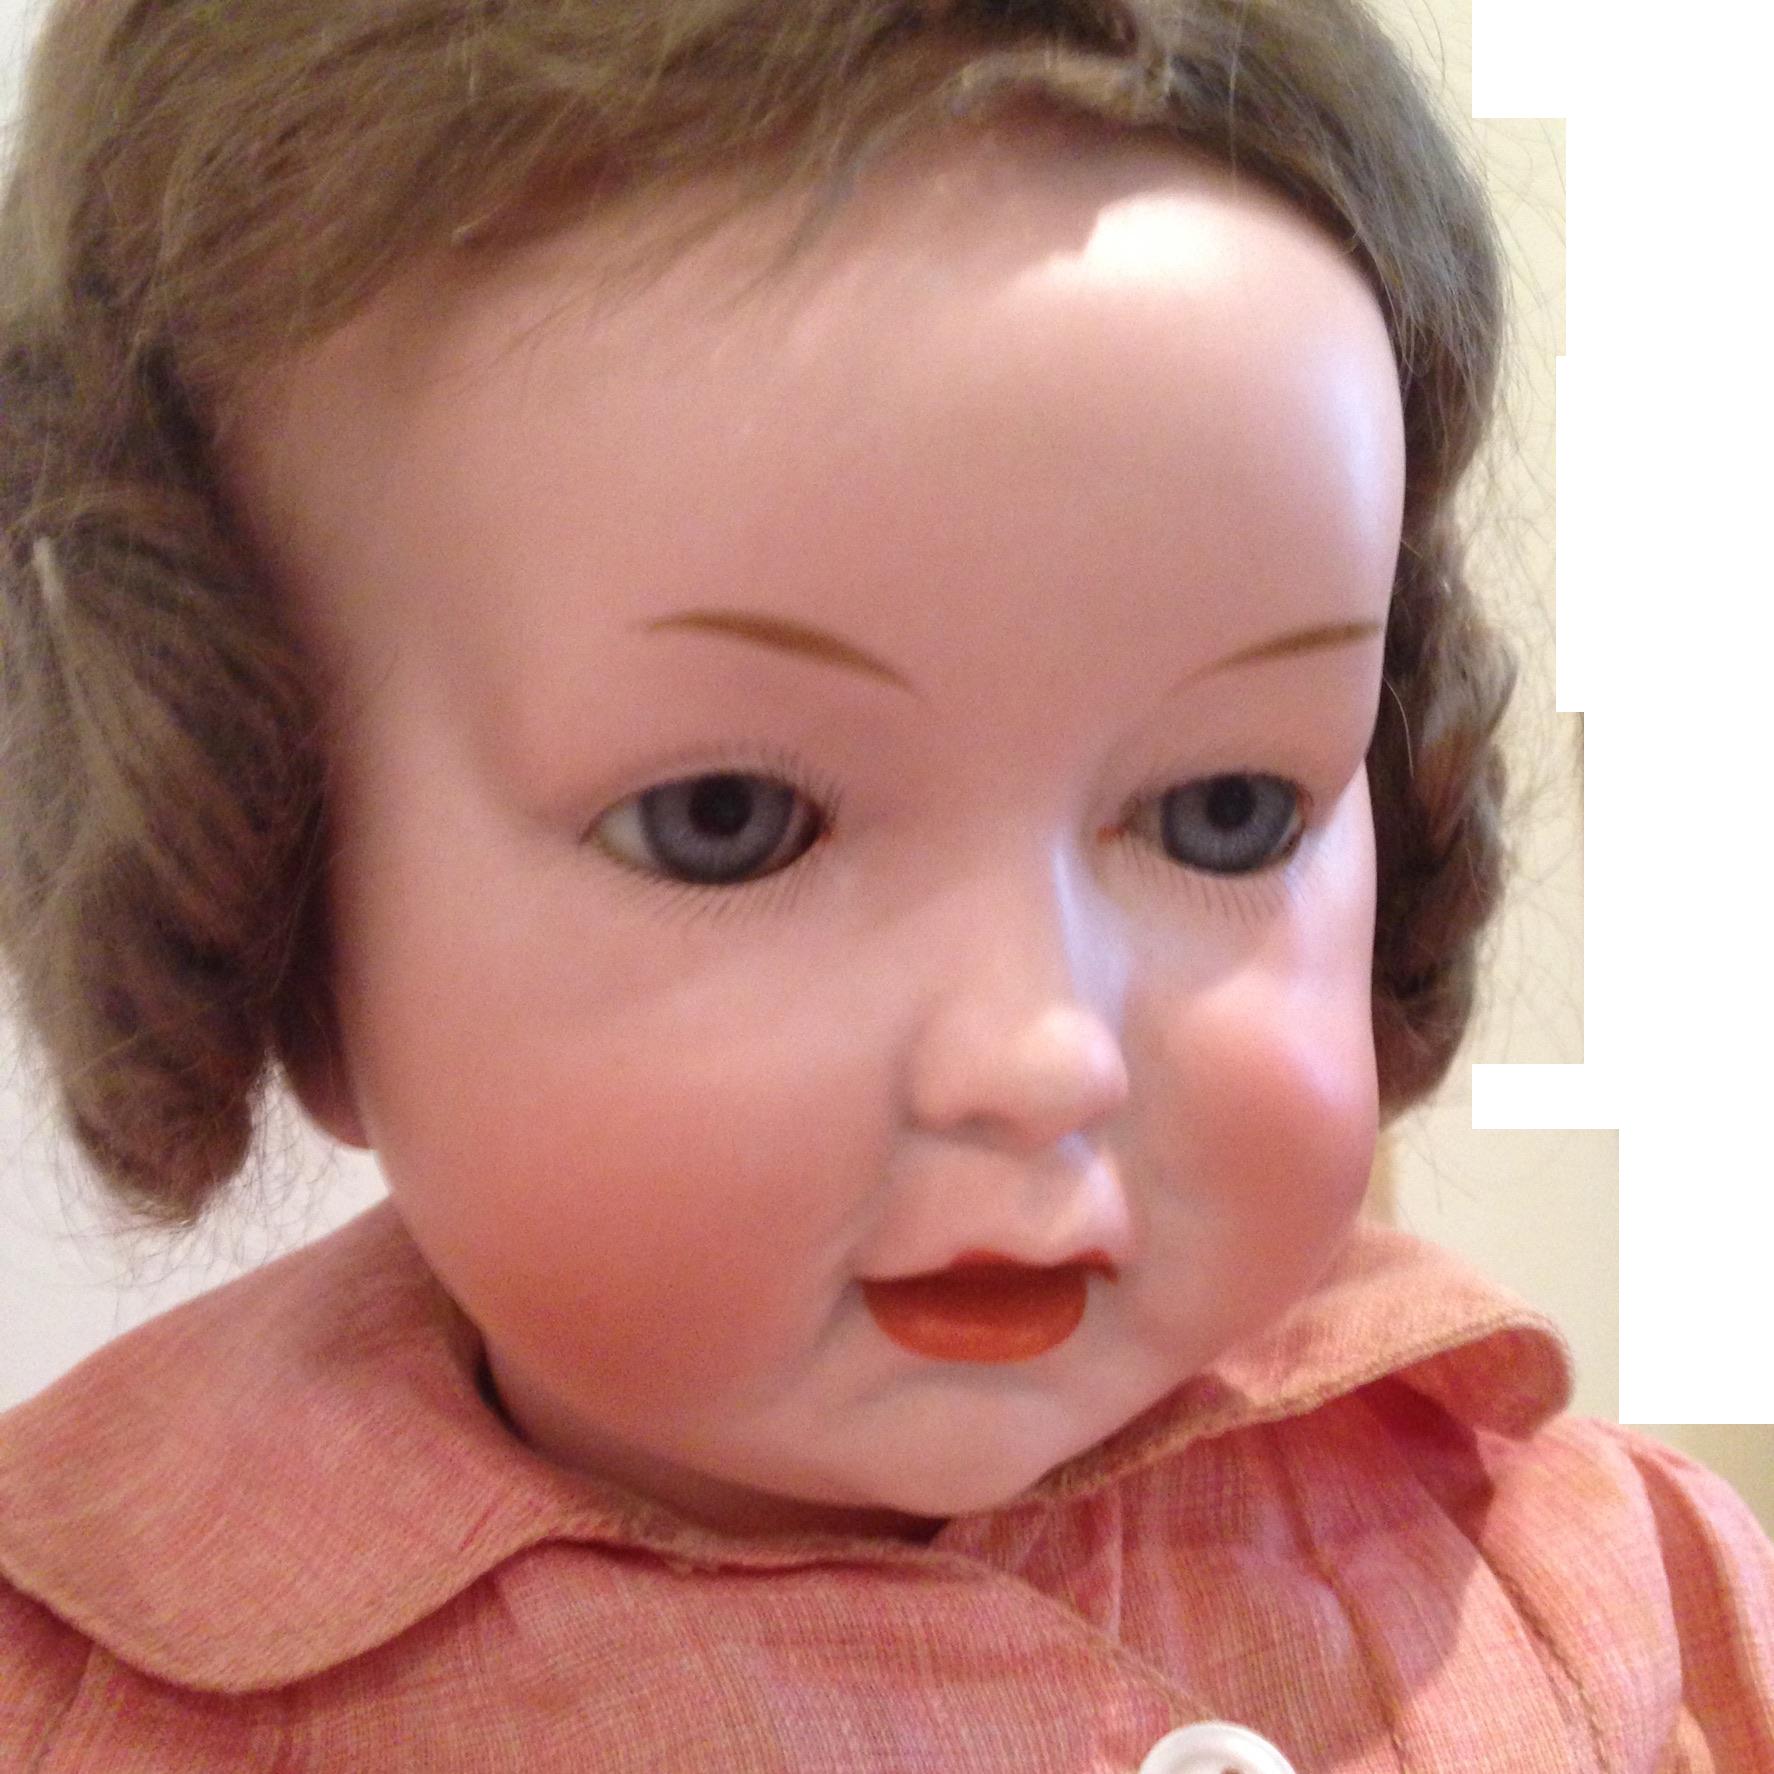 Outstanding German BII character toddler